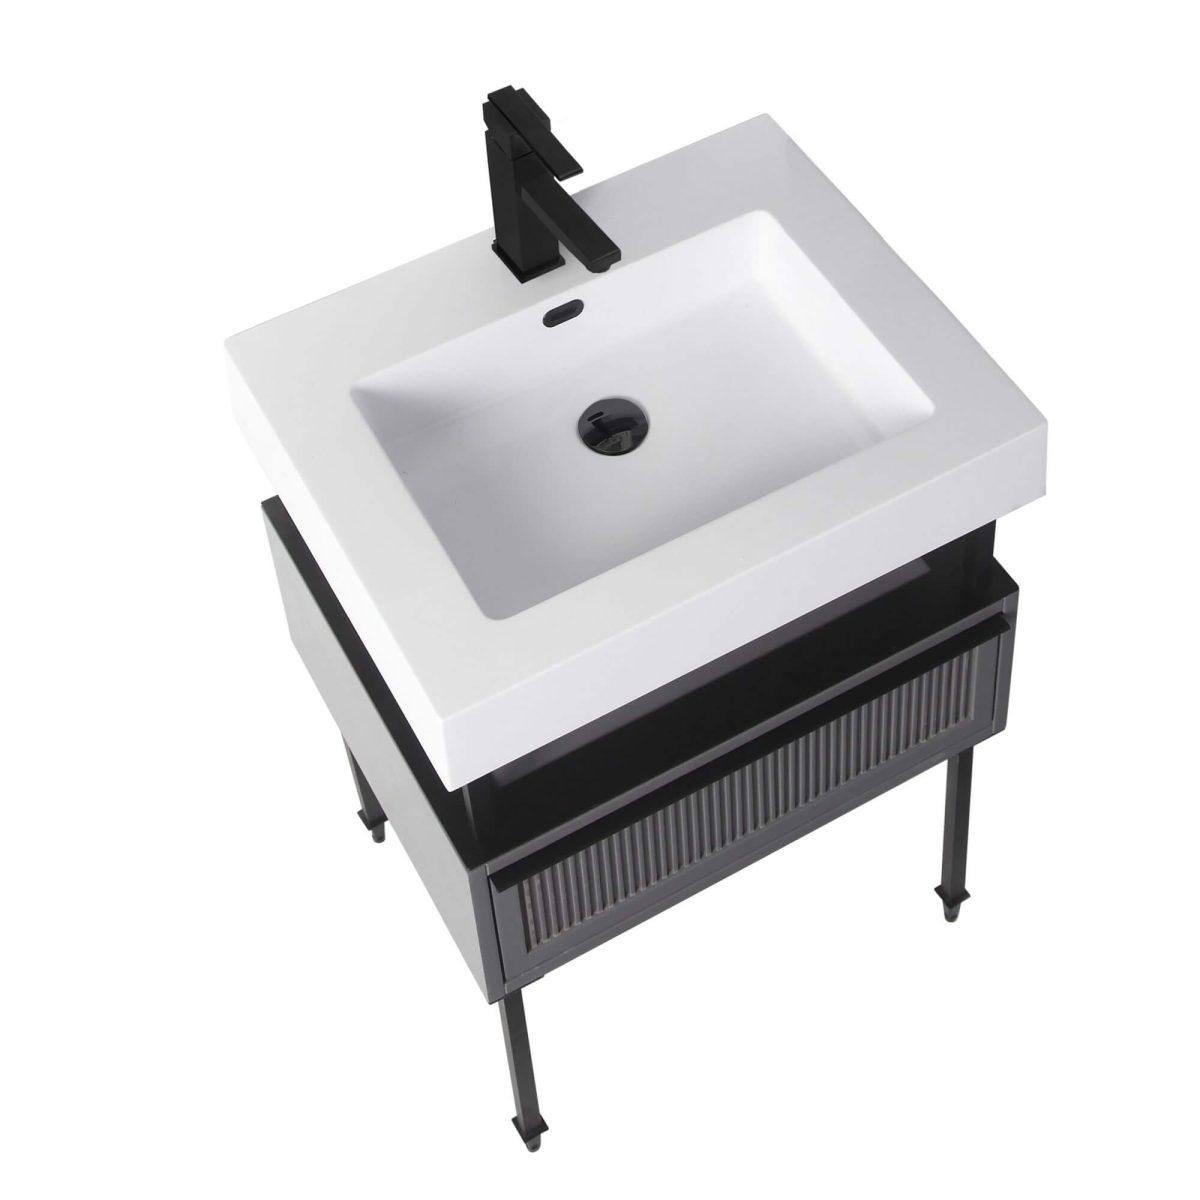 "Dakota 24"" Modern Bathroom Vanity  Rock Gray with Black Hardware"